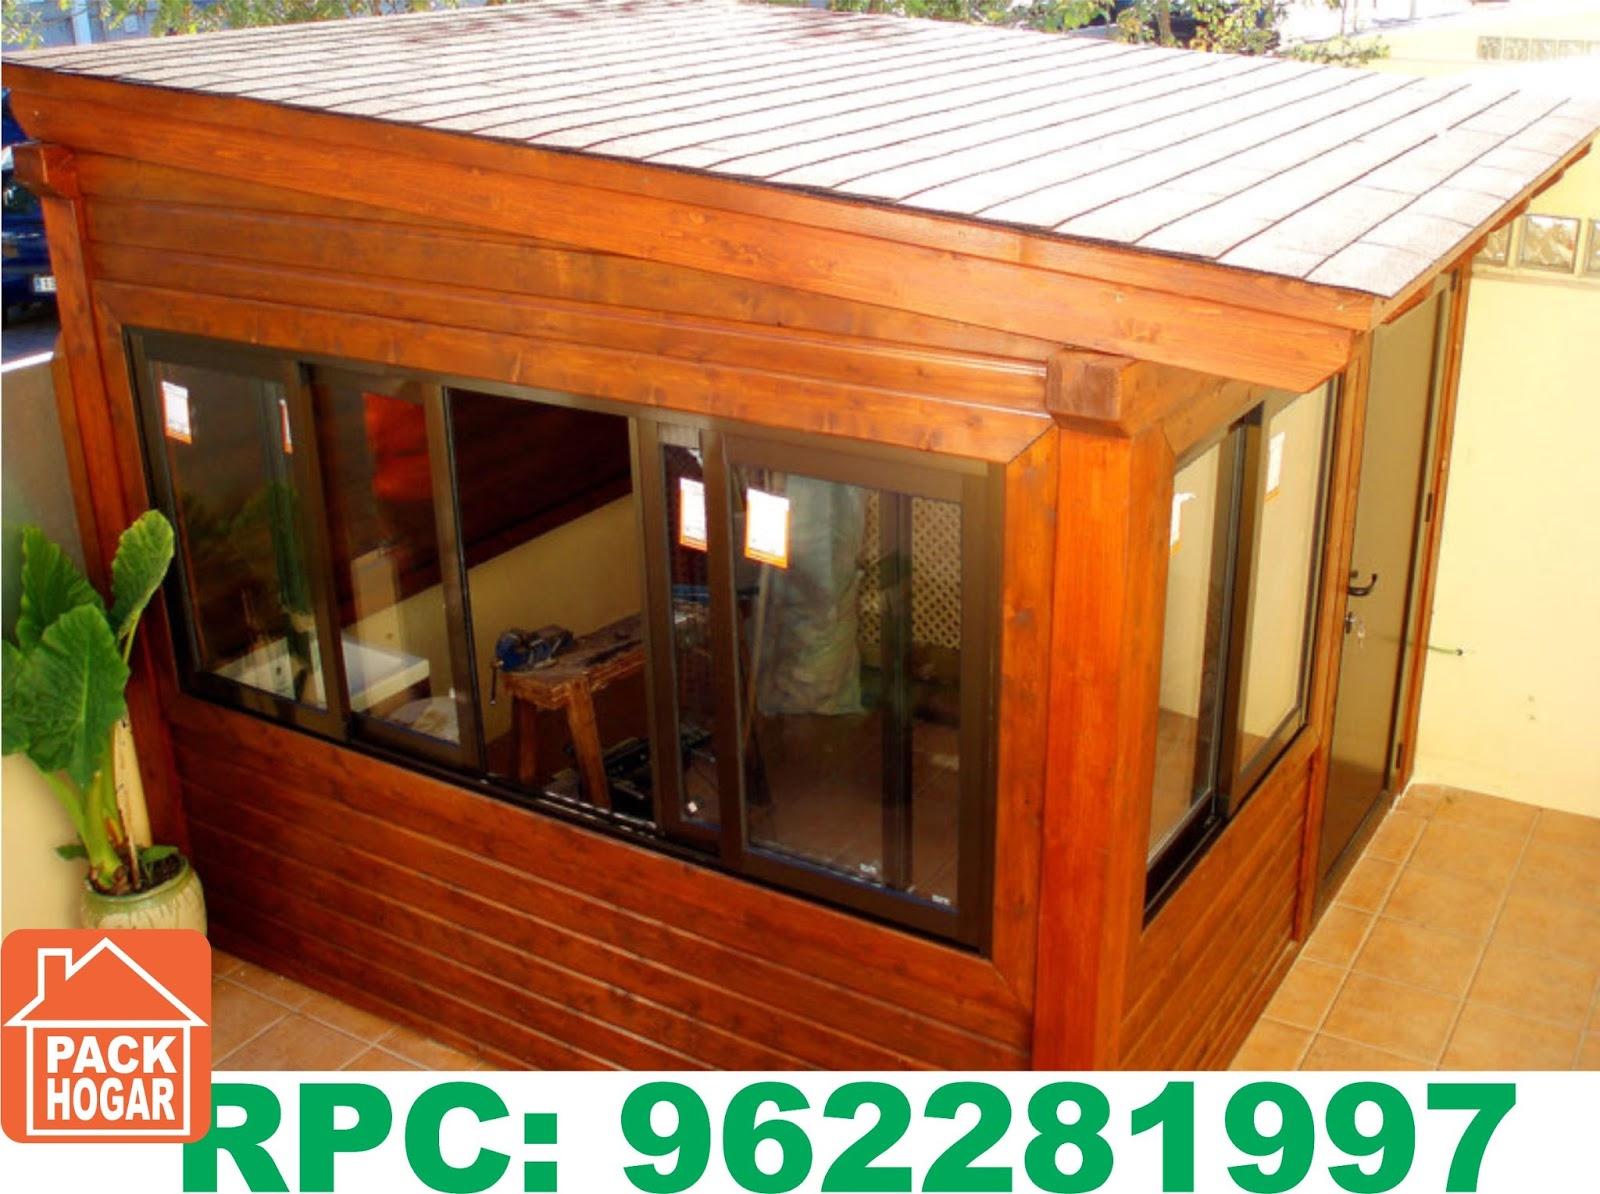 Casetas cuartos habitables prefabricadas de madera lima - Casetas de madera para terraza ...